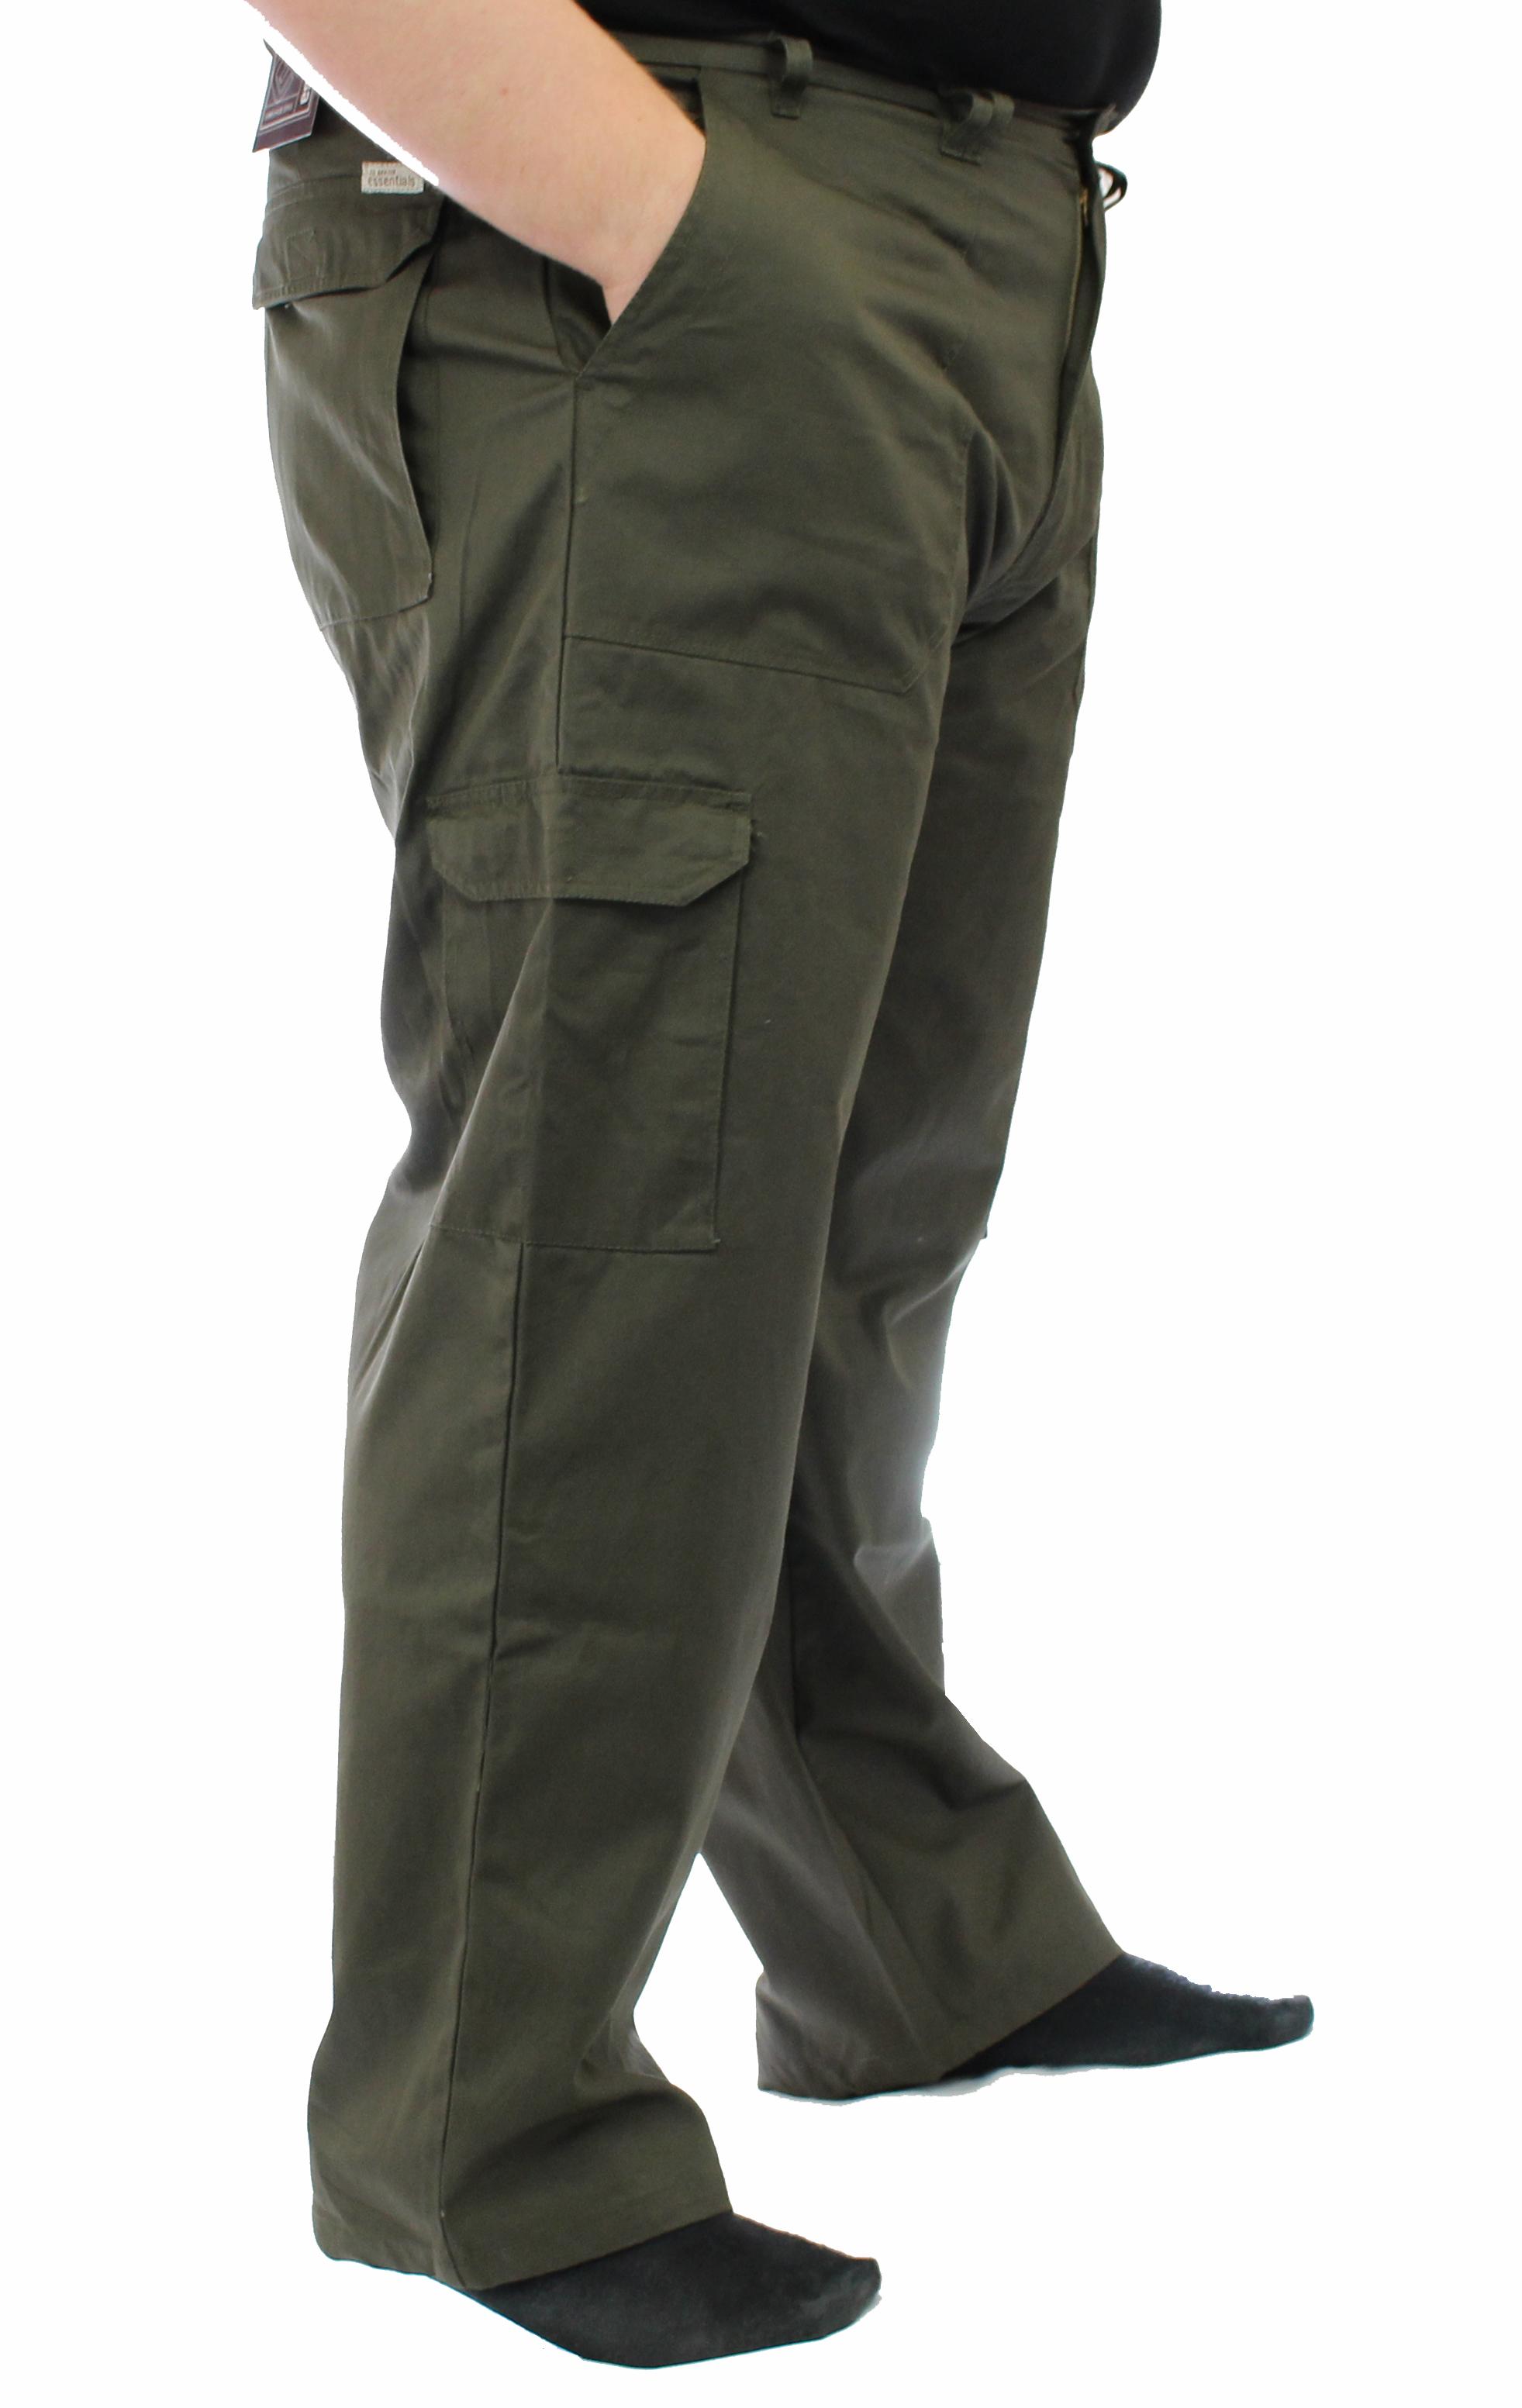 "Ed Baxter Victory - Heavy Duty Cargo Combat Trousers - Khaki - 56"" Waist, 34"" Leg"